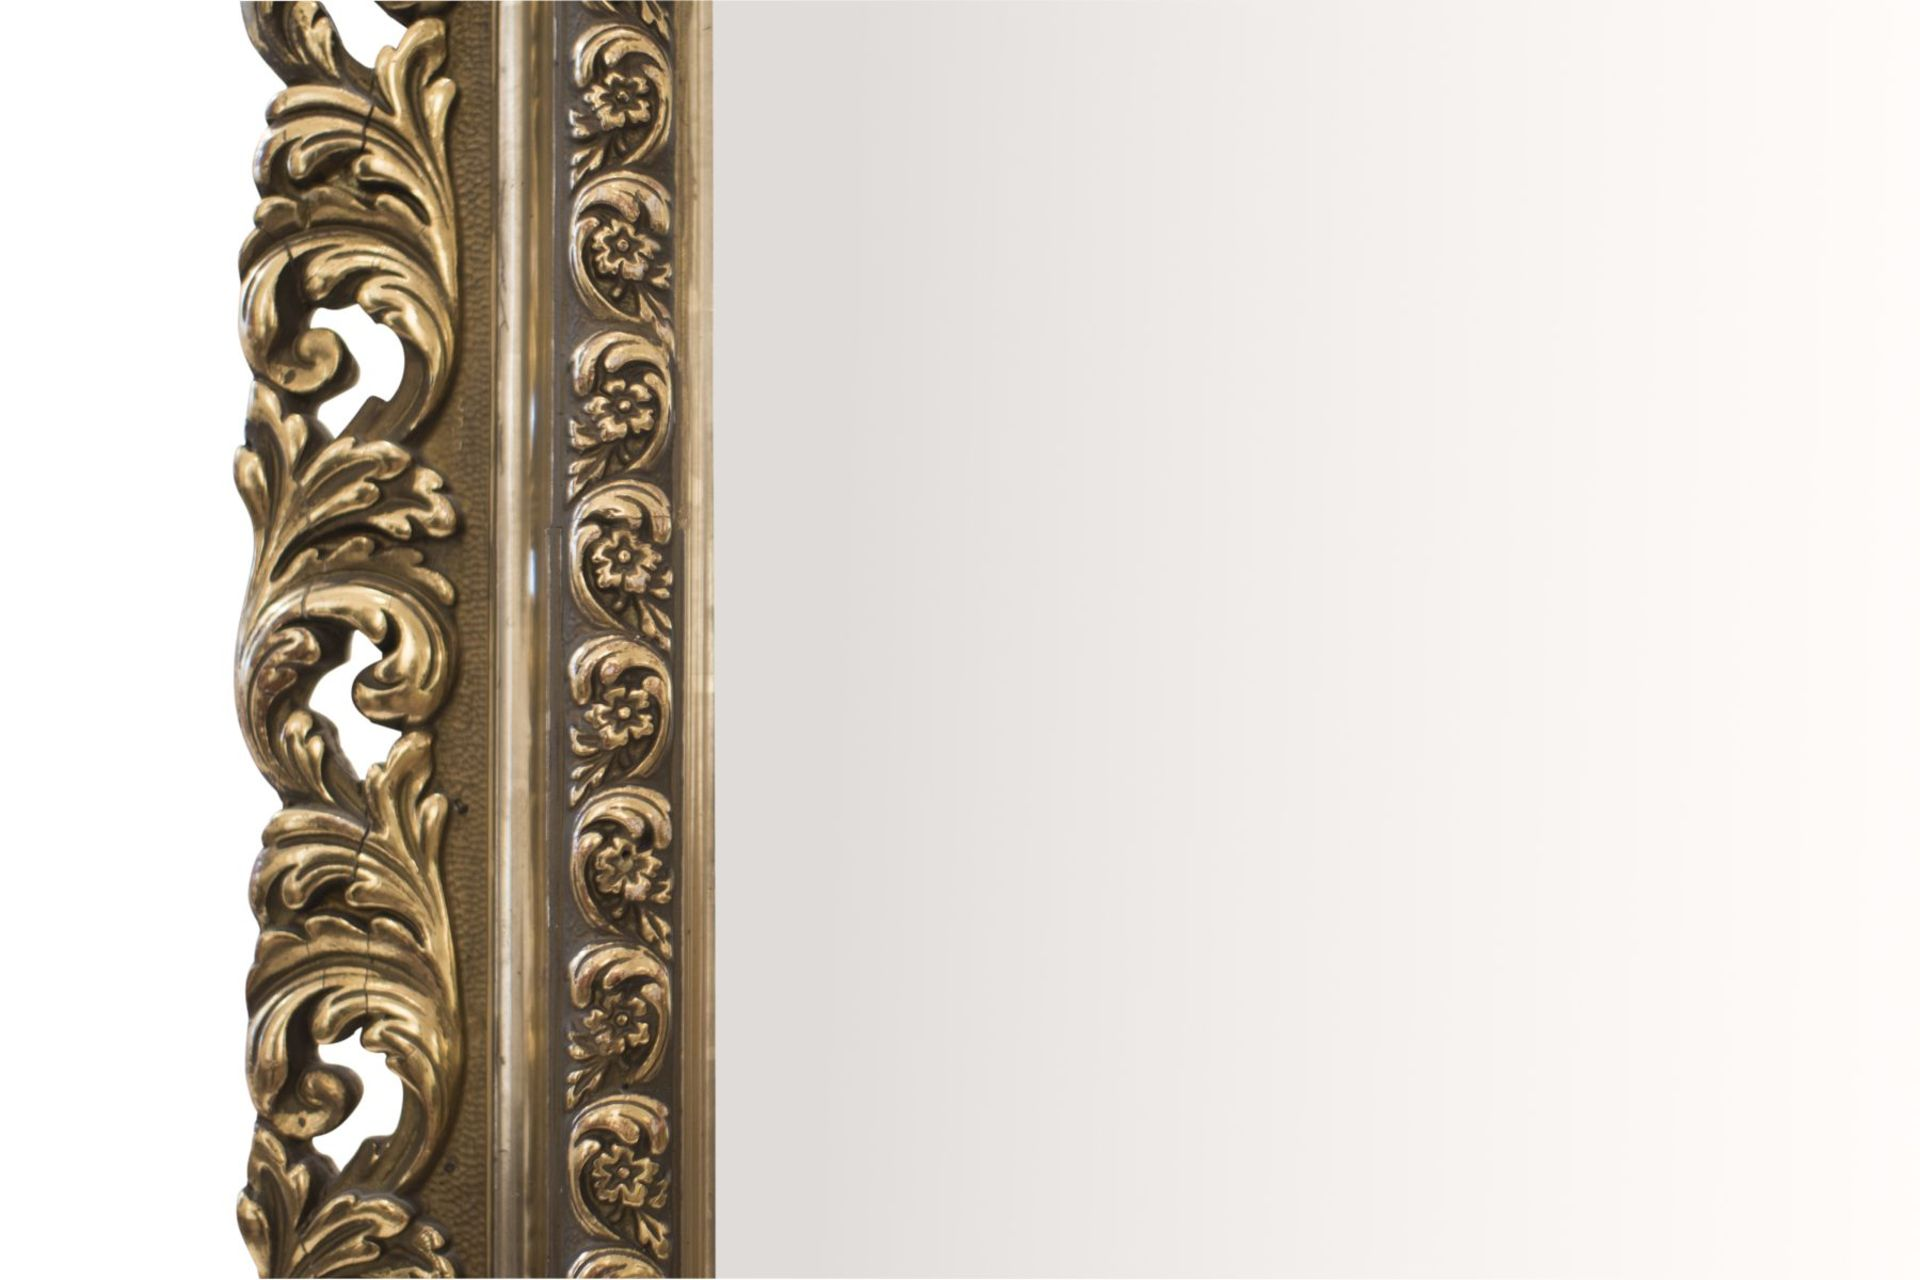 Decorative mirror - Image 2 of 5